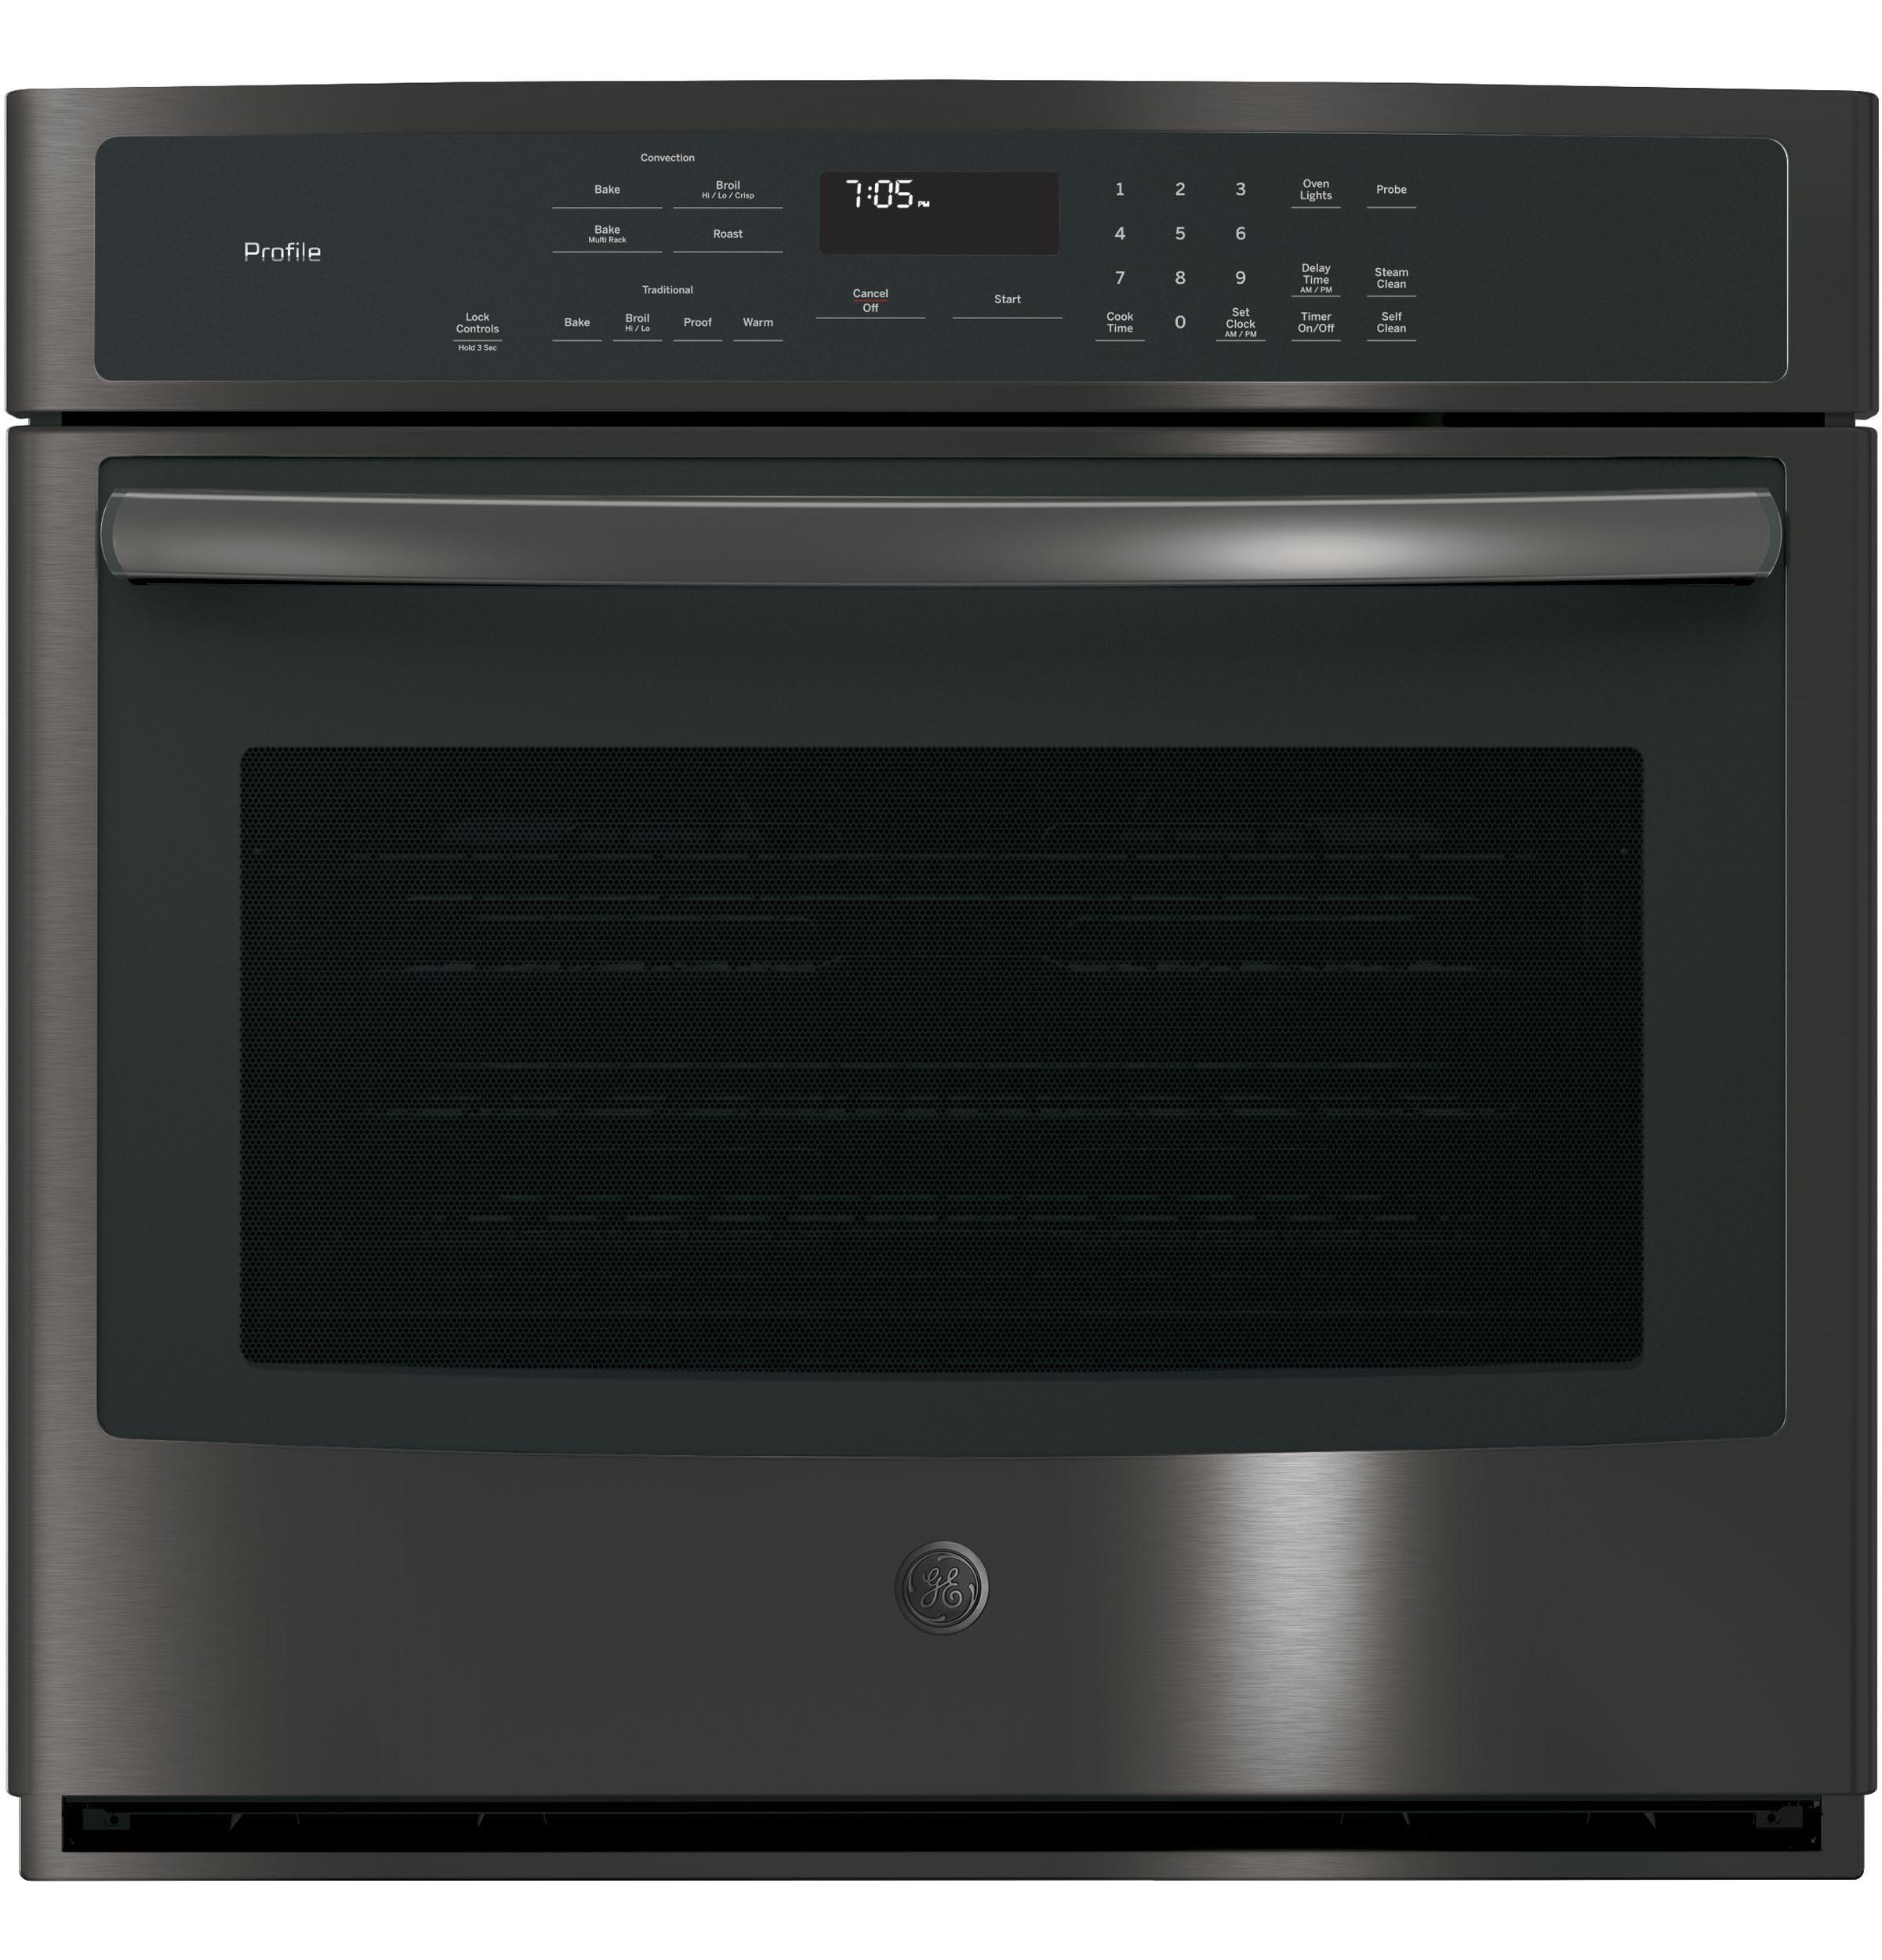 "PT7050BLTS GE Profile GE Profile™ Series 30"" BuiltIn"